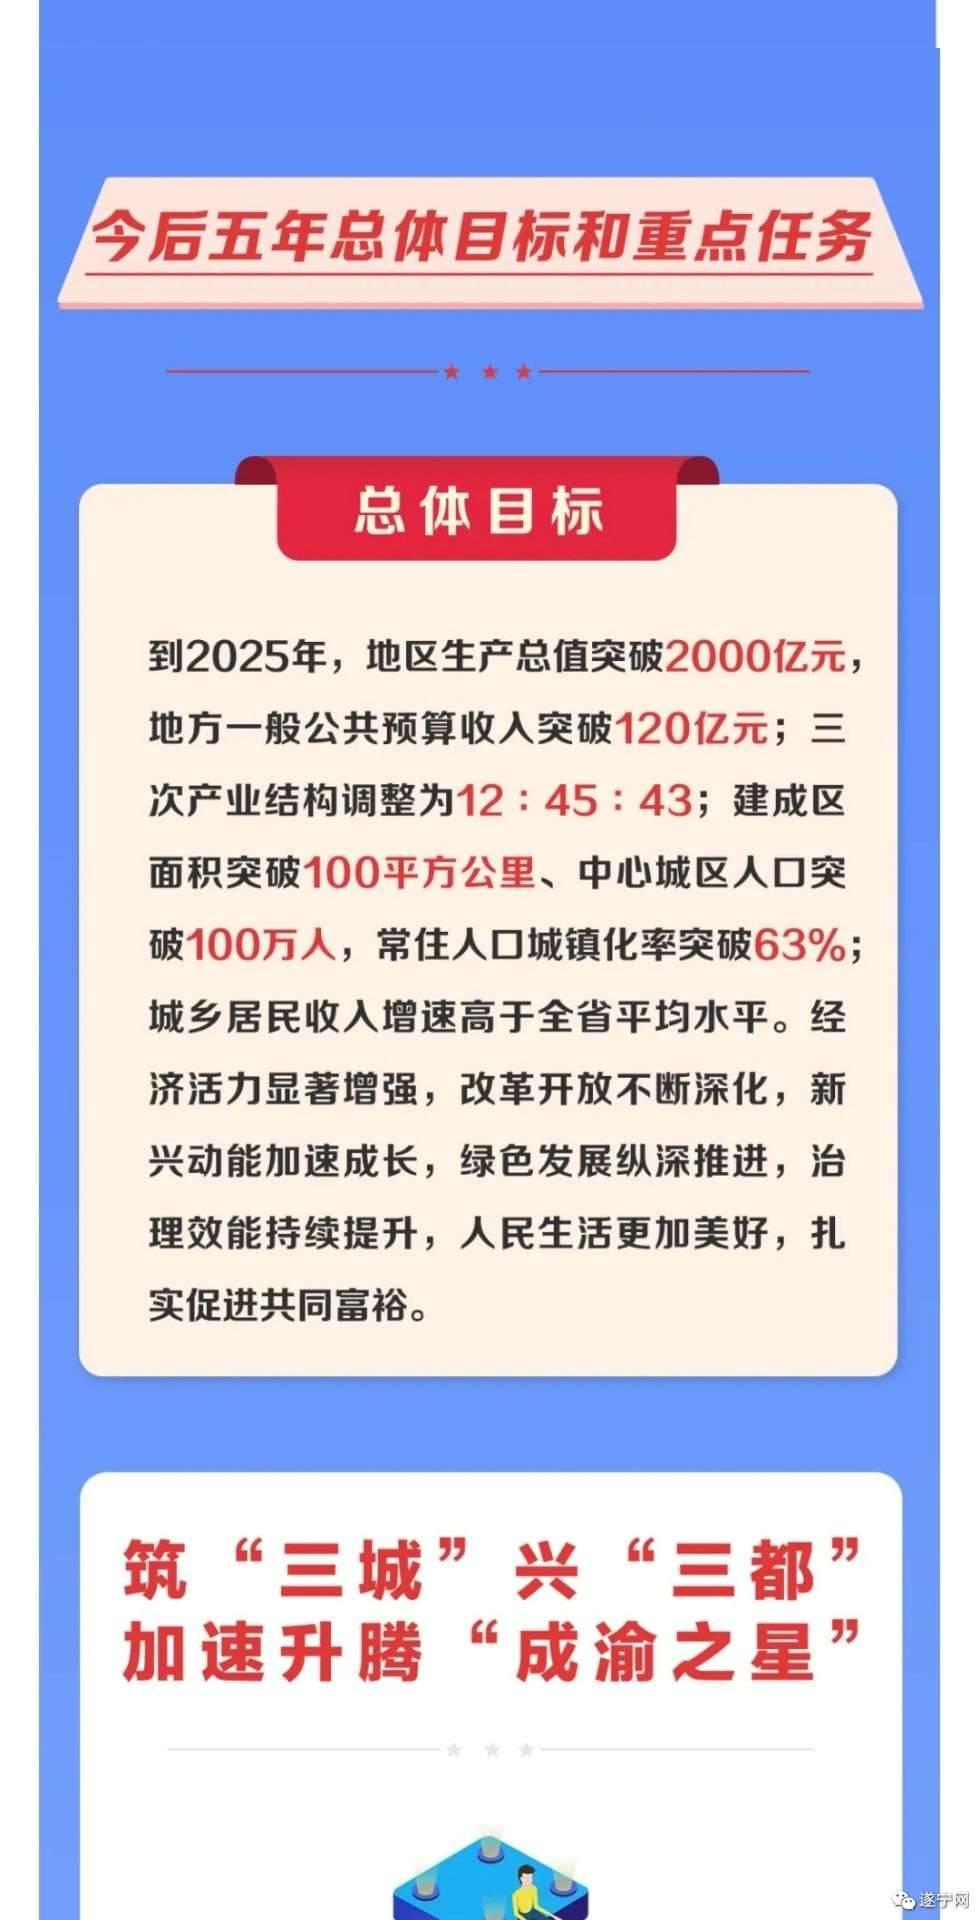 front2_0_FhghSbJGl3Fechly-VBjrFexoQUB.1630811765.jpg